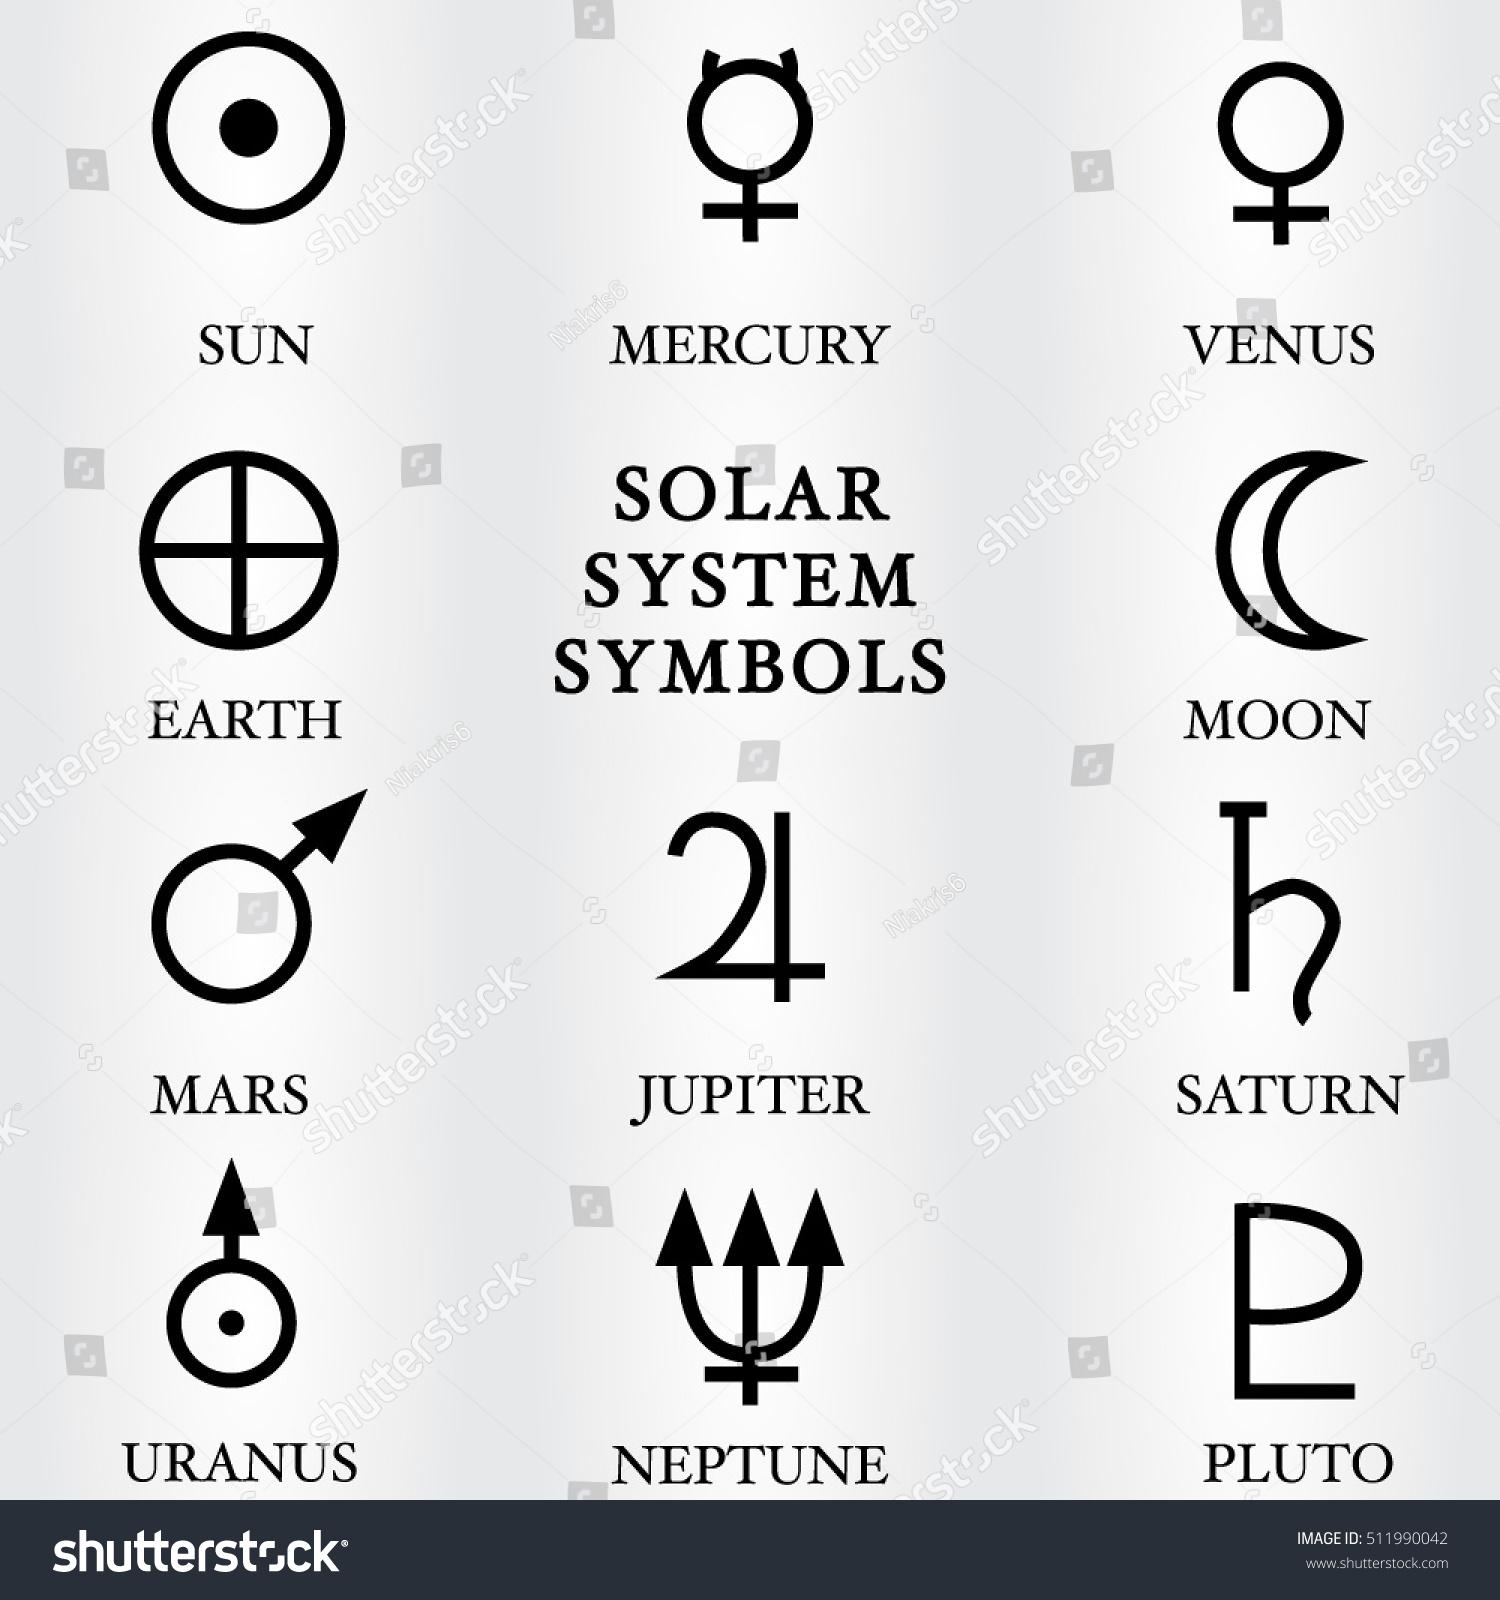 Solar system symbols gallery symbol and sign ideas royalty free vector illustration of the solar system 511990042 vector illustration of the solar system symbols buycottarizona